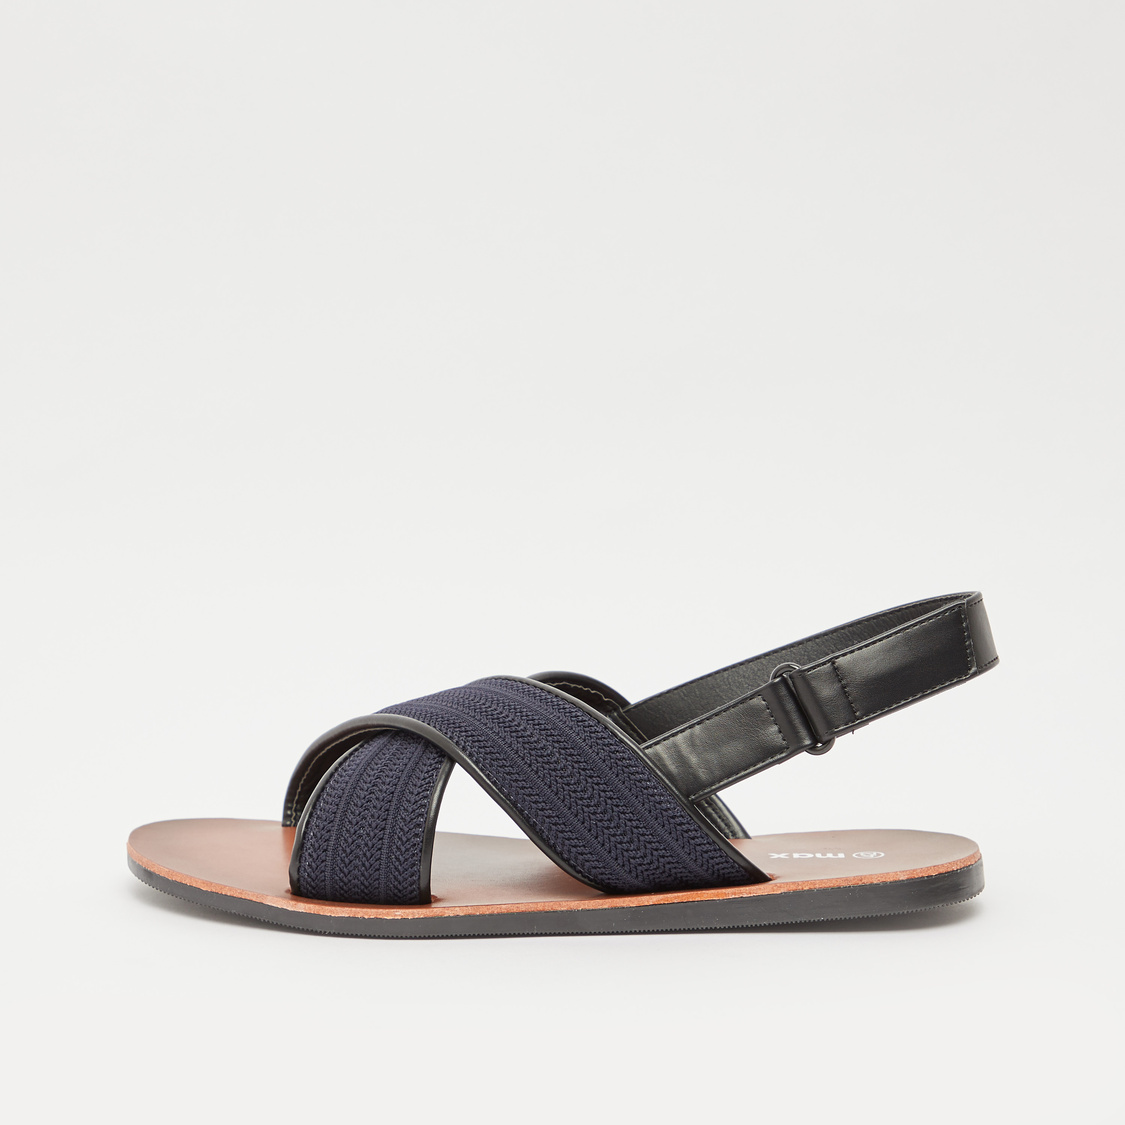 Textured Criss Cross Strap Slingback Sandals